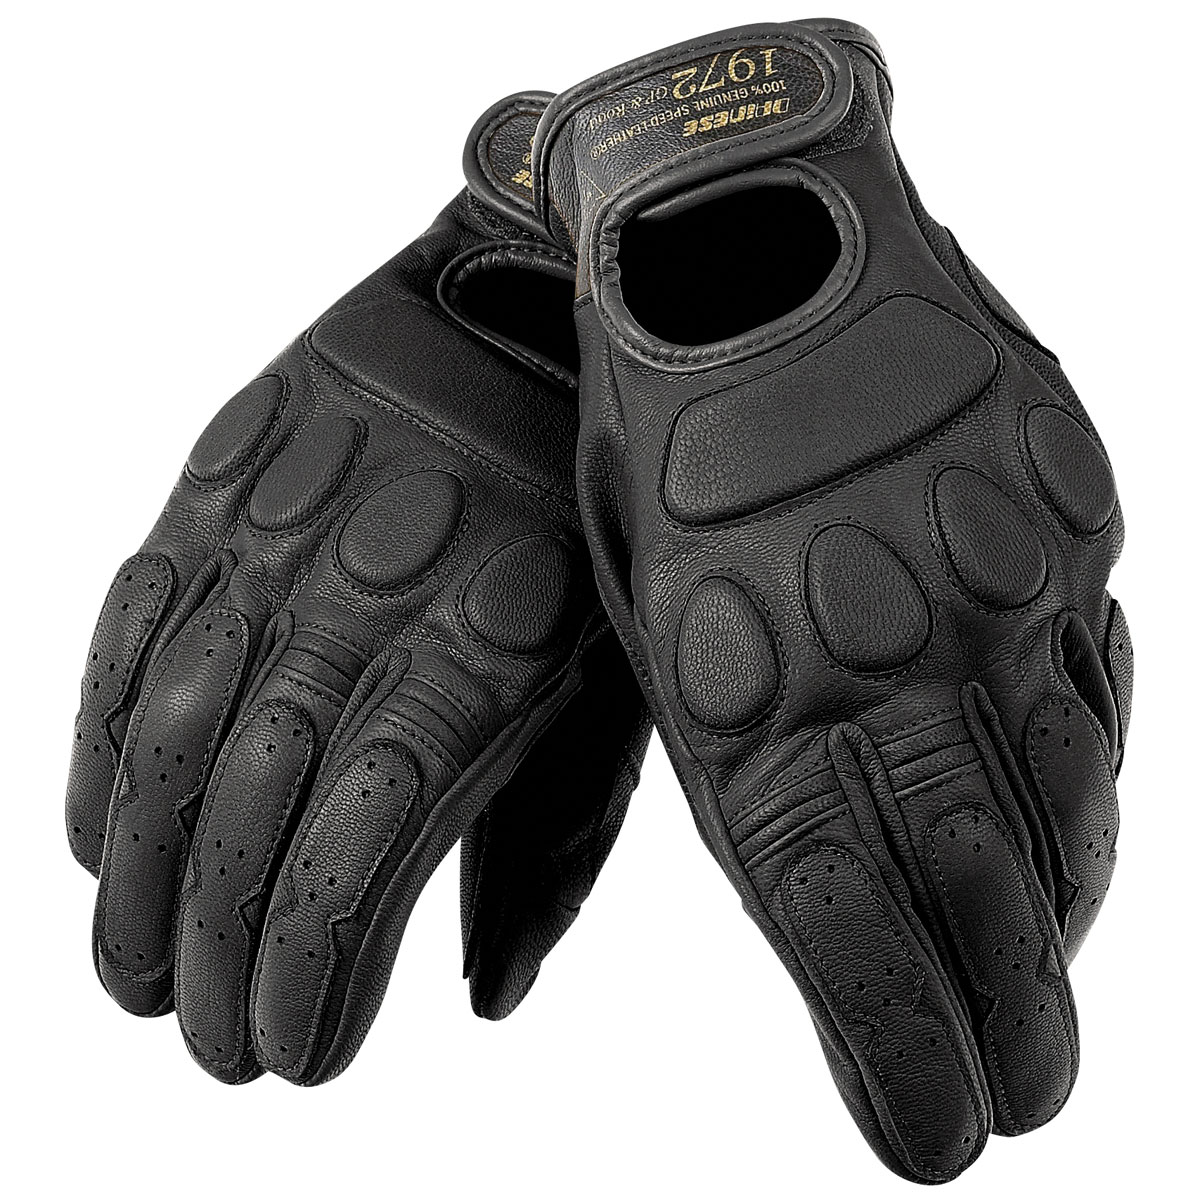 Dainese Unisex Blackjack Black Leather Gloves